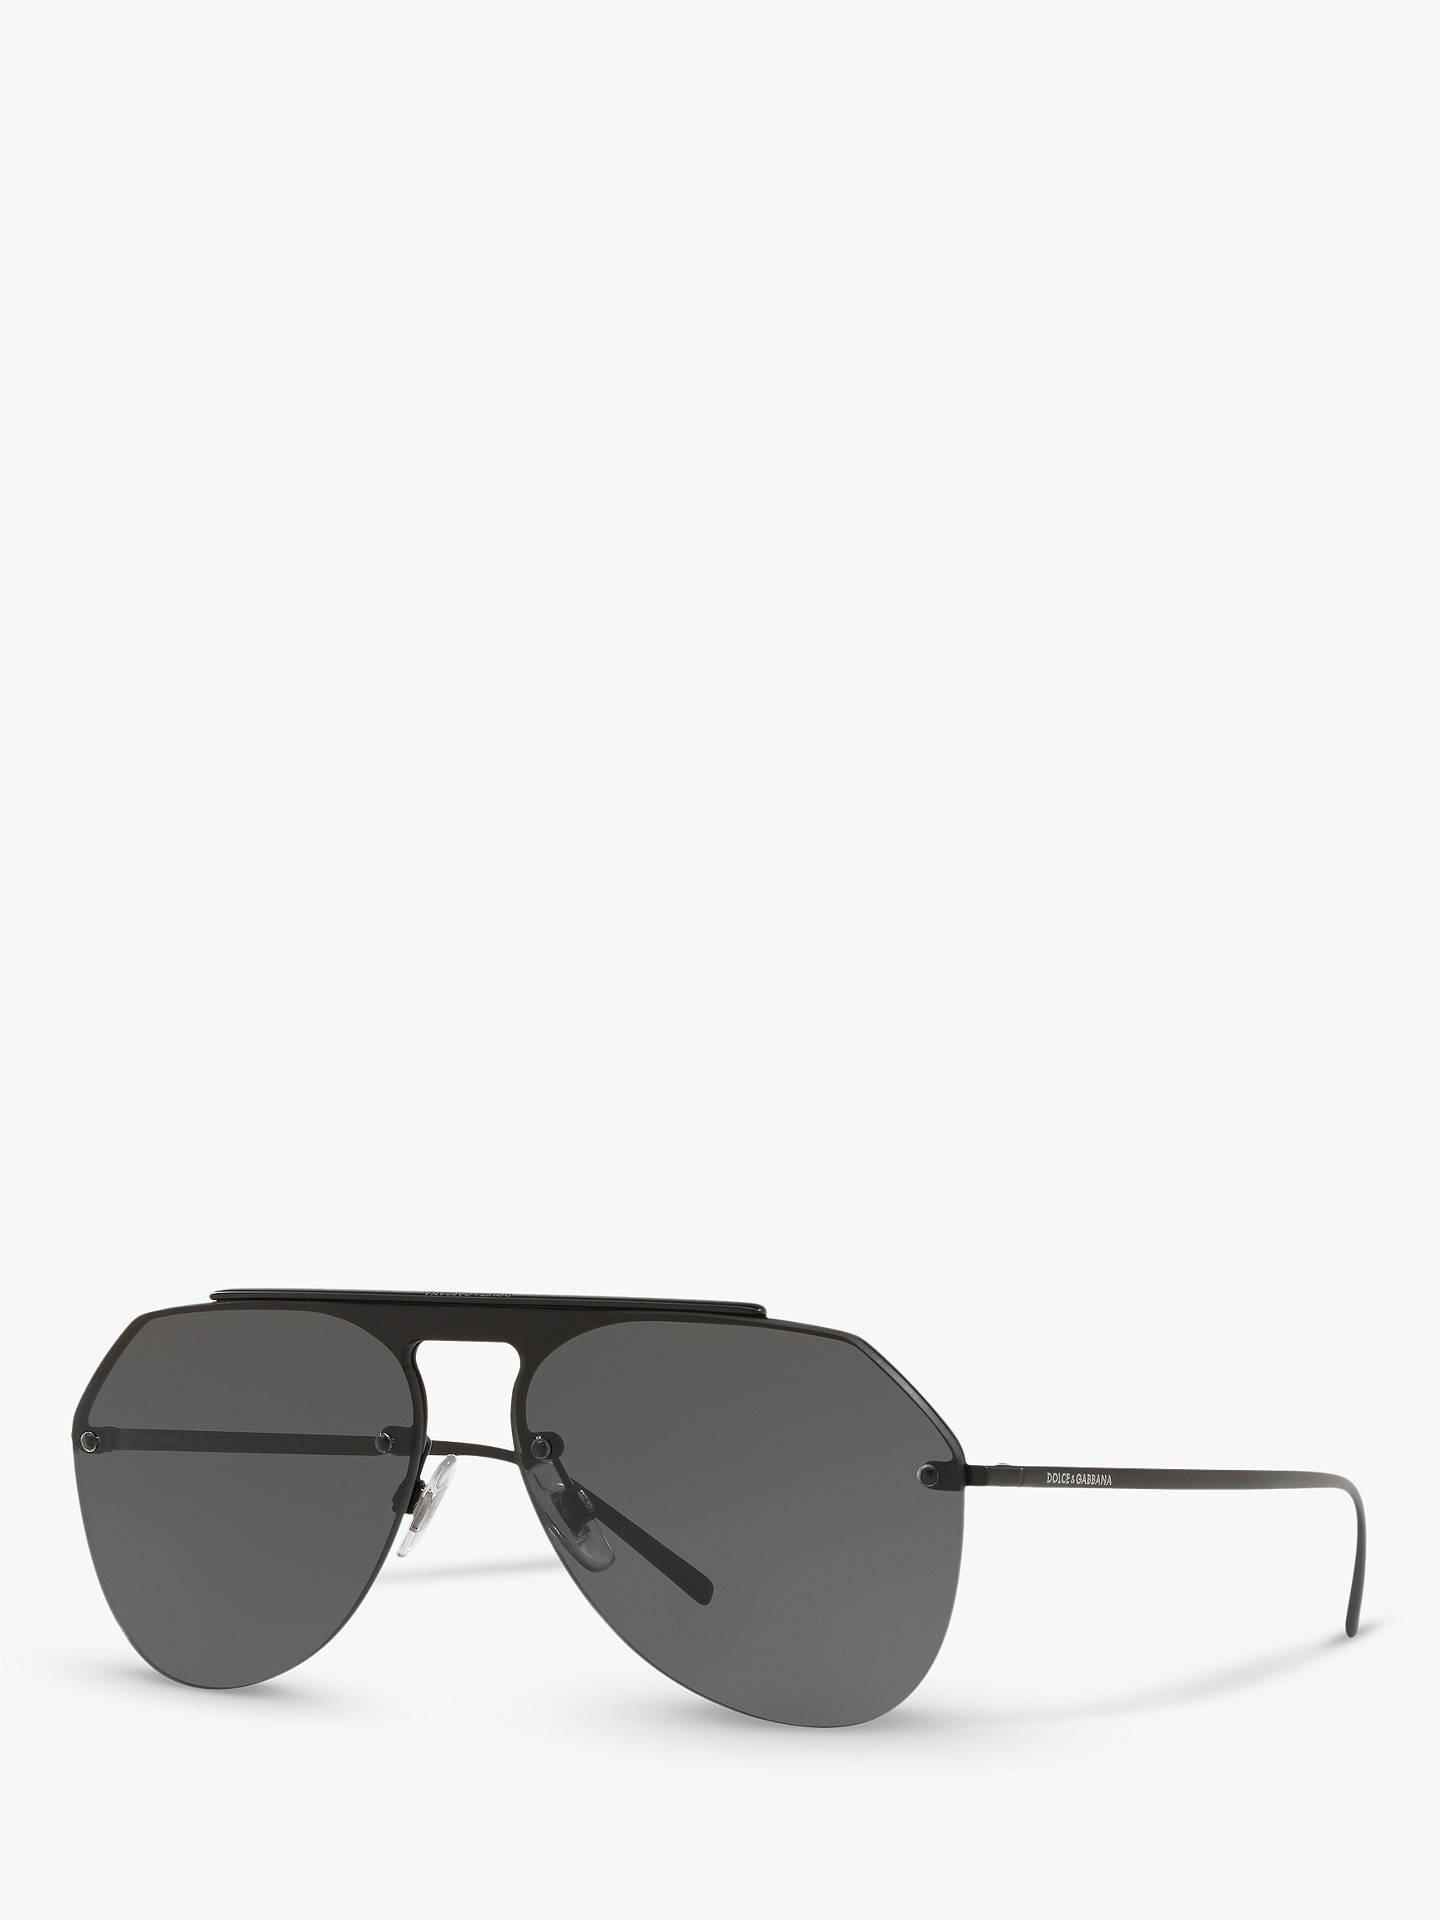 2bd68885f70 Dolce   Gabbana DG2213 Men s Aviator Sunglasses at John Lewis   Partners